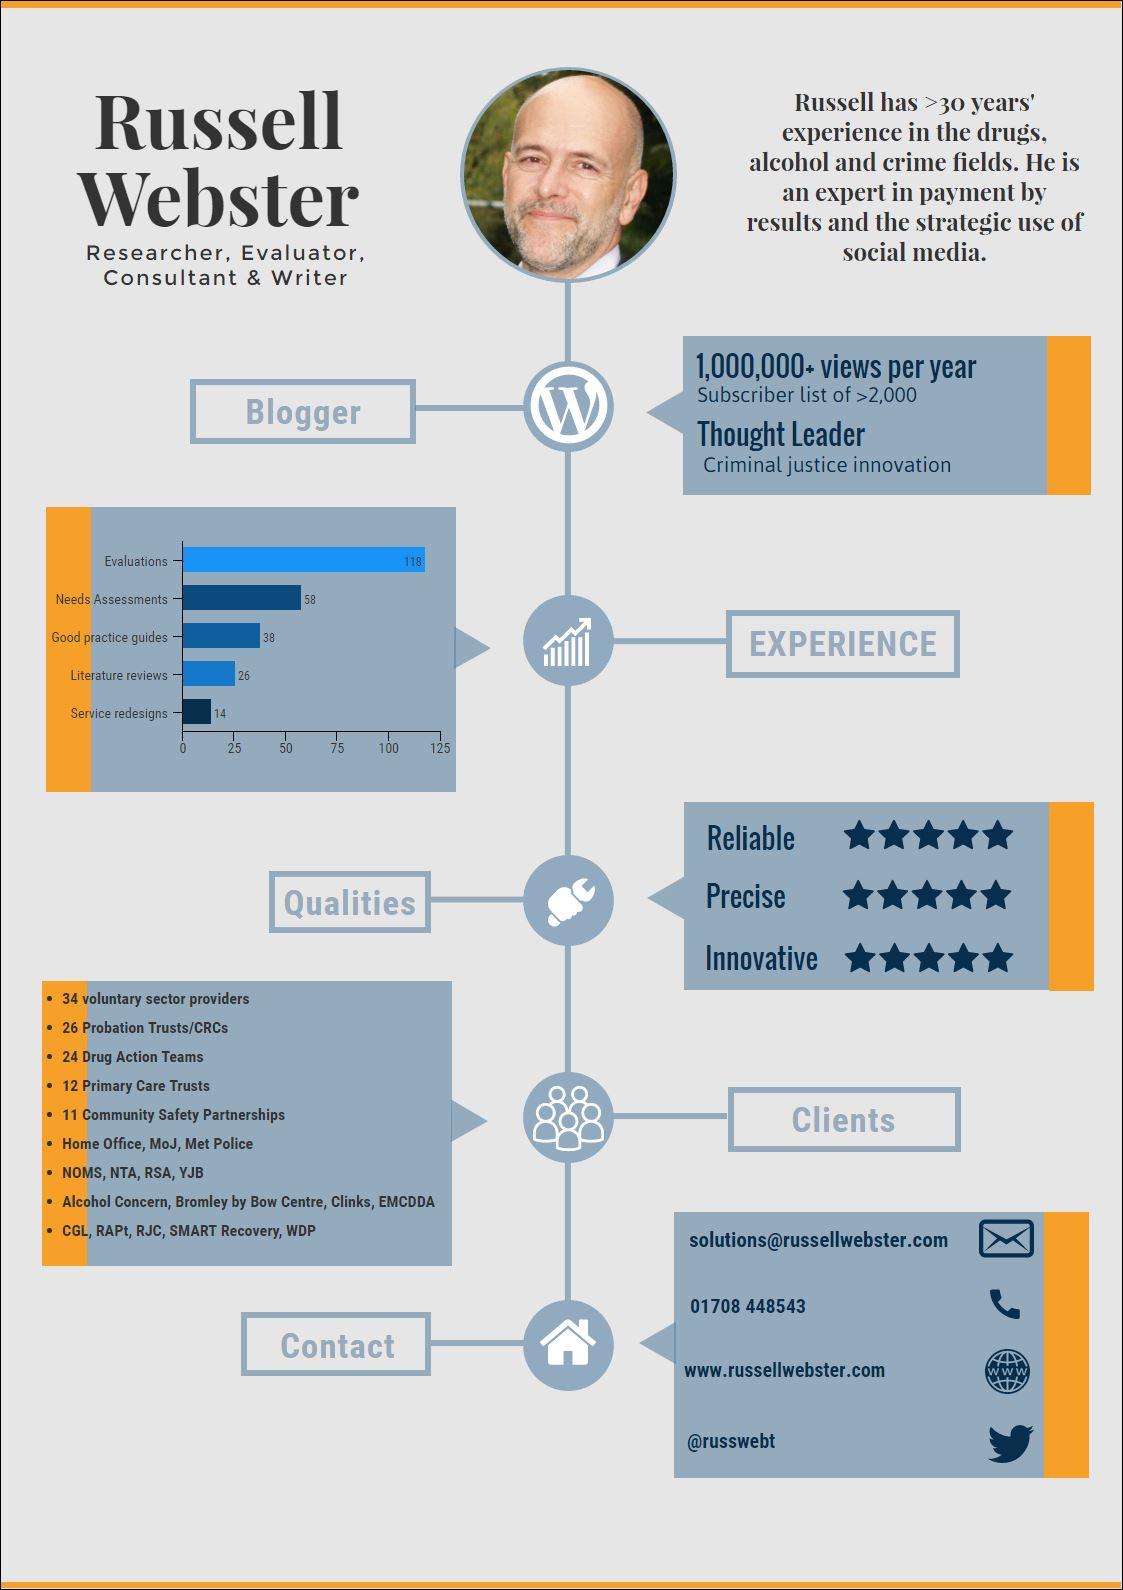 russ-cv-infographic-snip